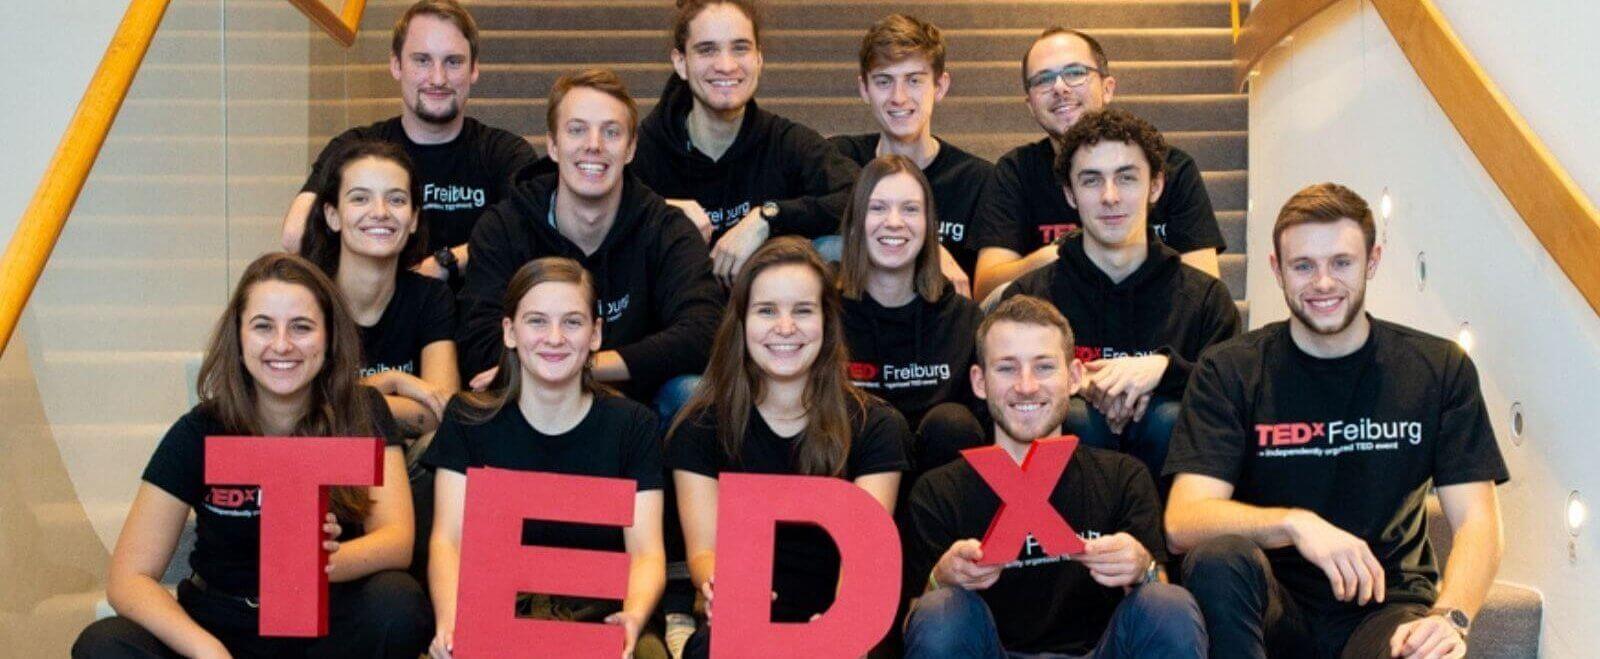 TEDx Freiburg 2021